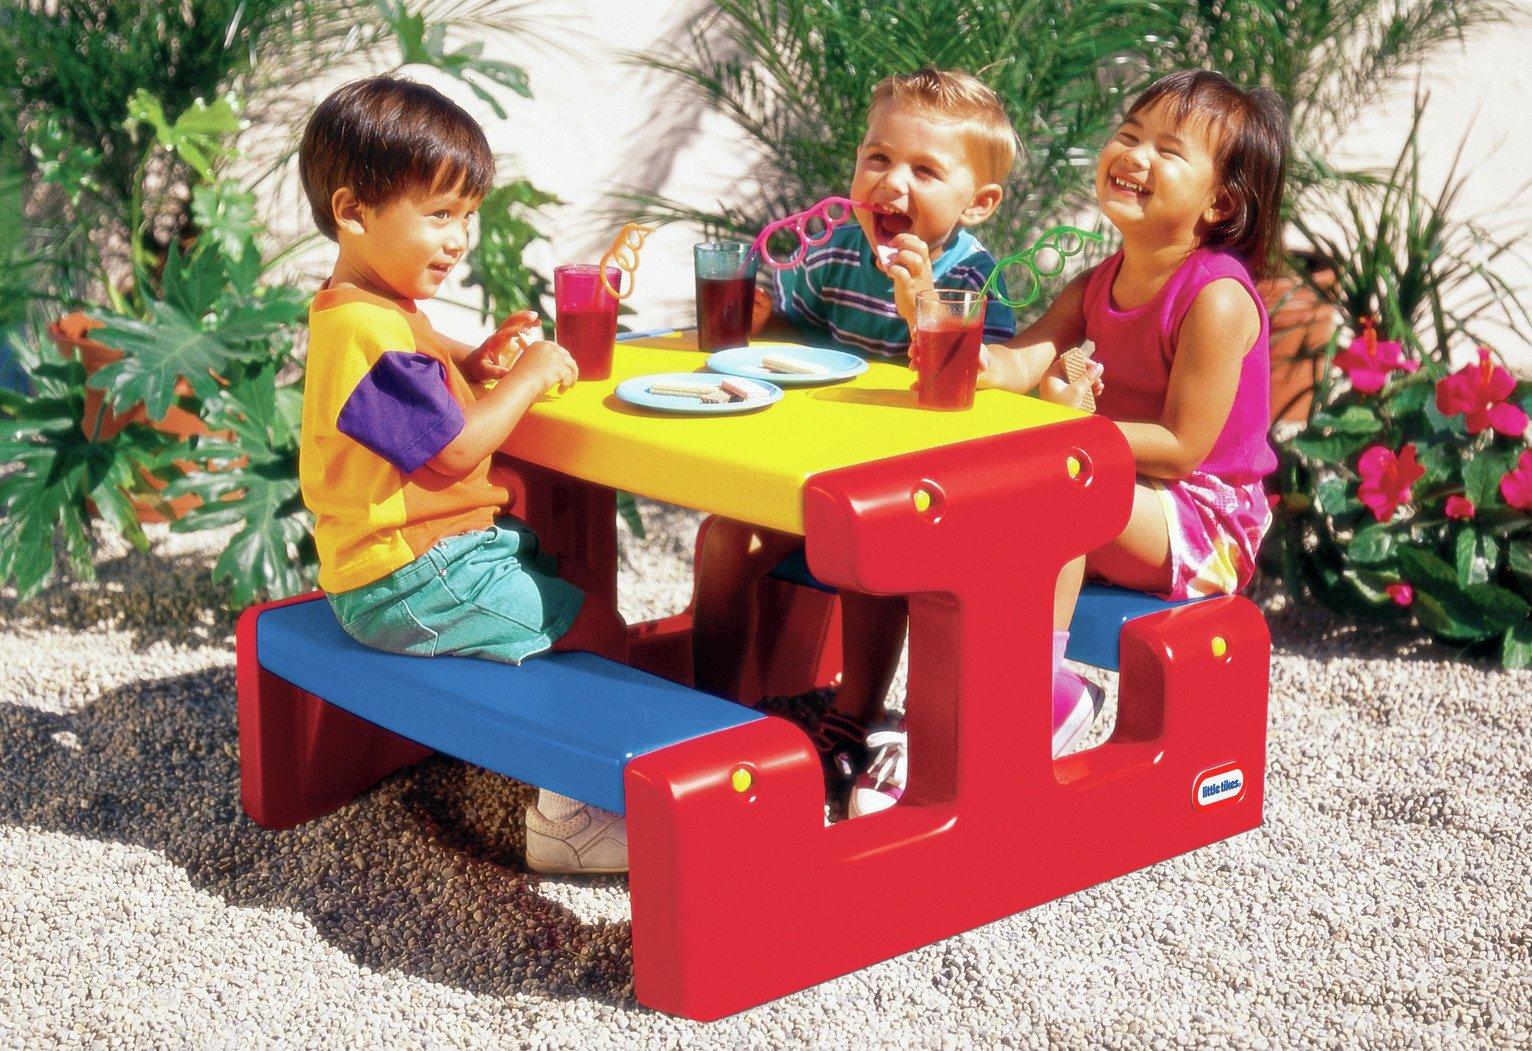 Little Tikes - Junior Picnic Table Primary